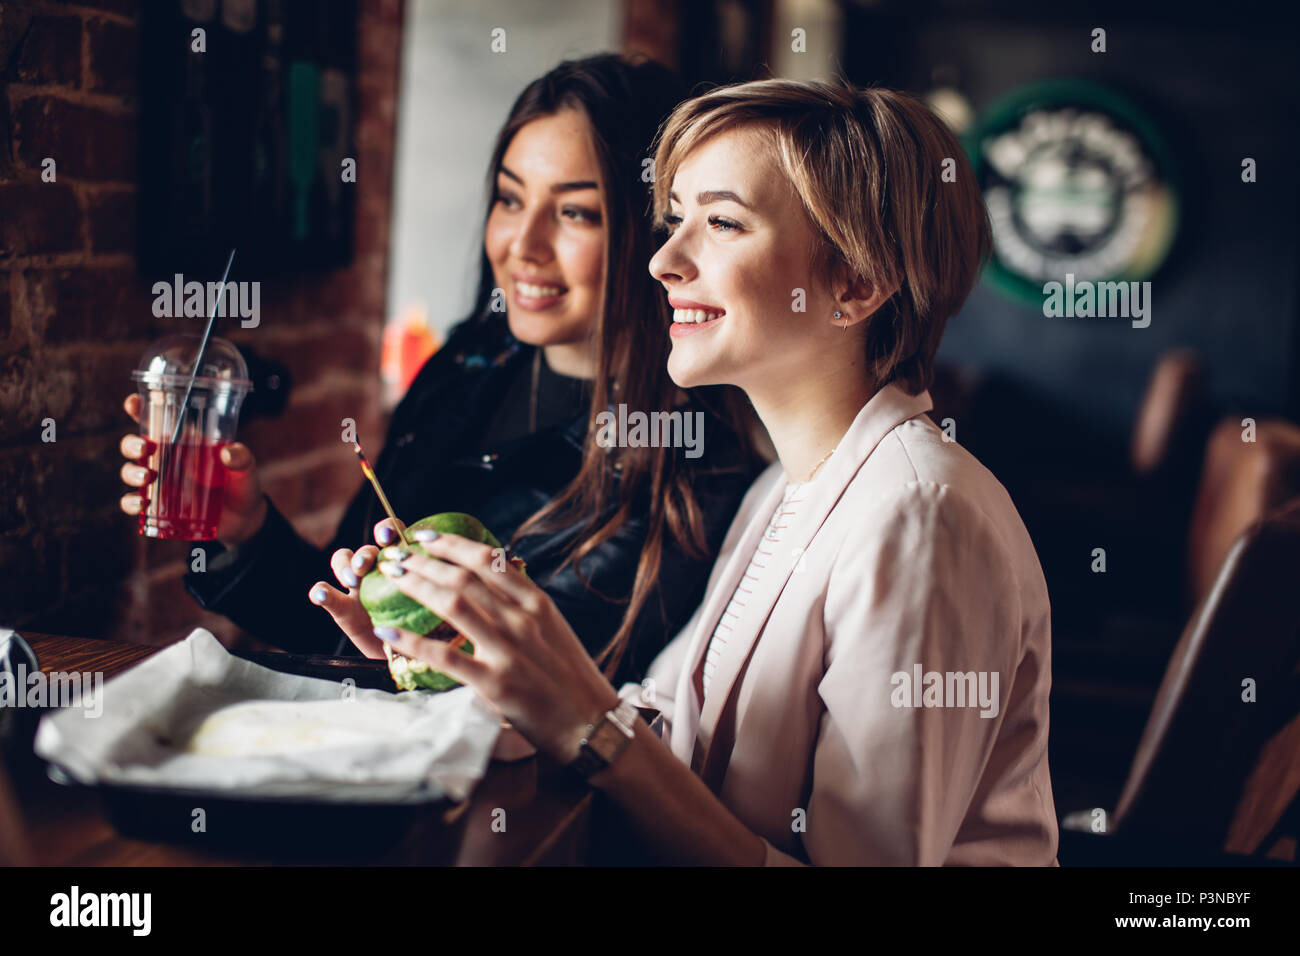 Zwei Freundinnen mit Abendmahl mit grünen Sandwich Burger Bar. Stockbild